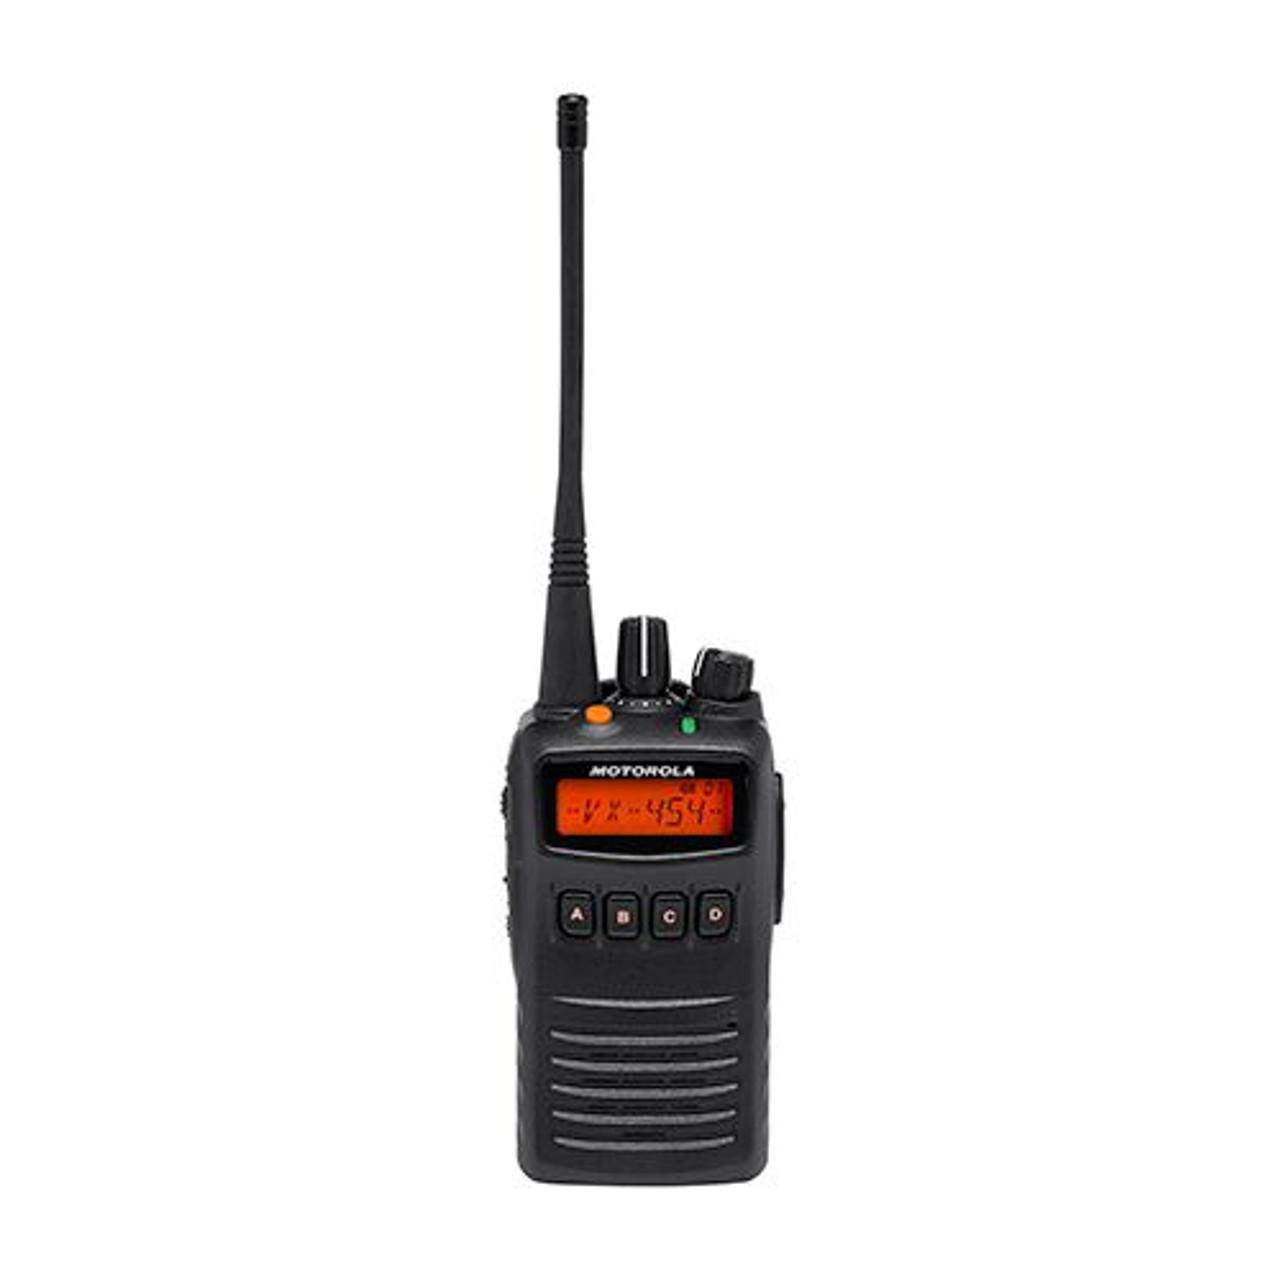 Motorola VX-454 512 Channel UHF or VHF Two Way Radio